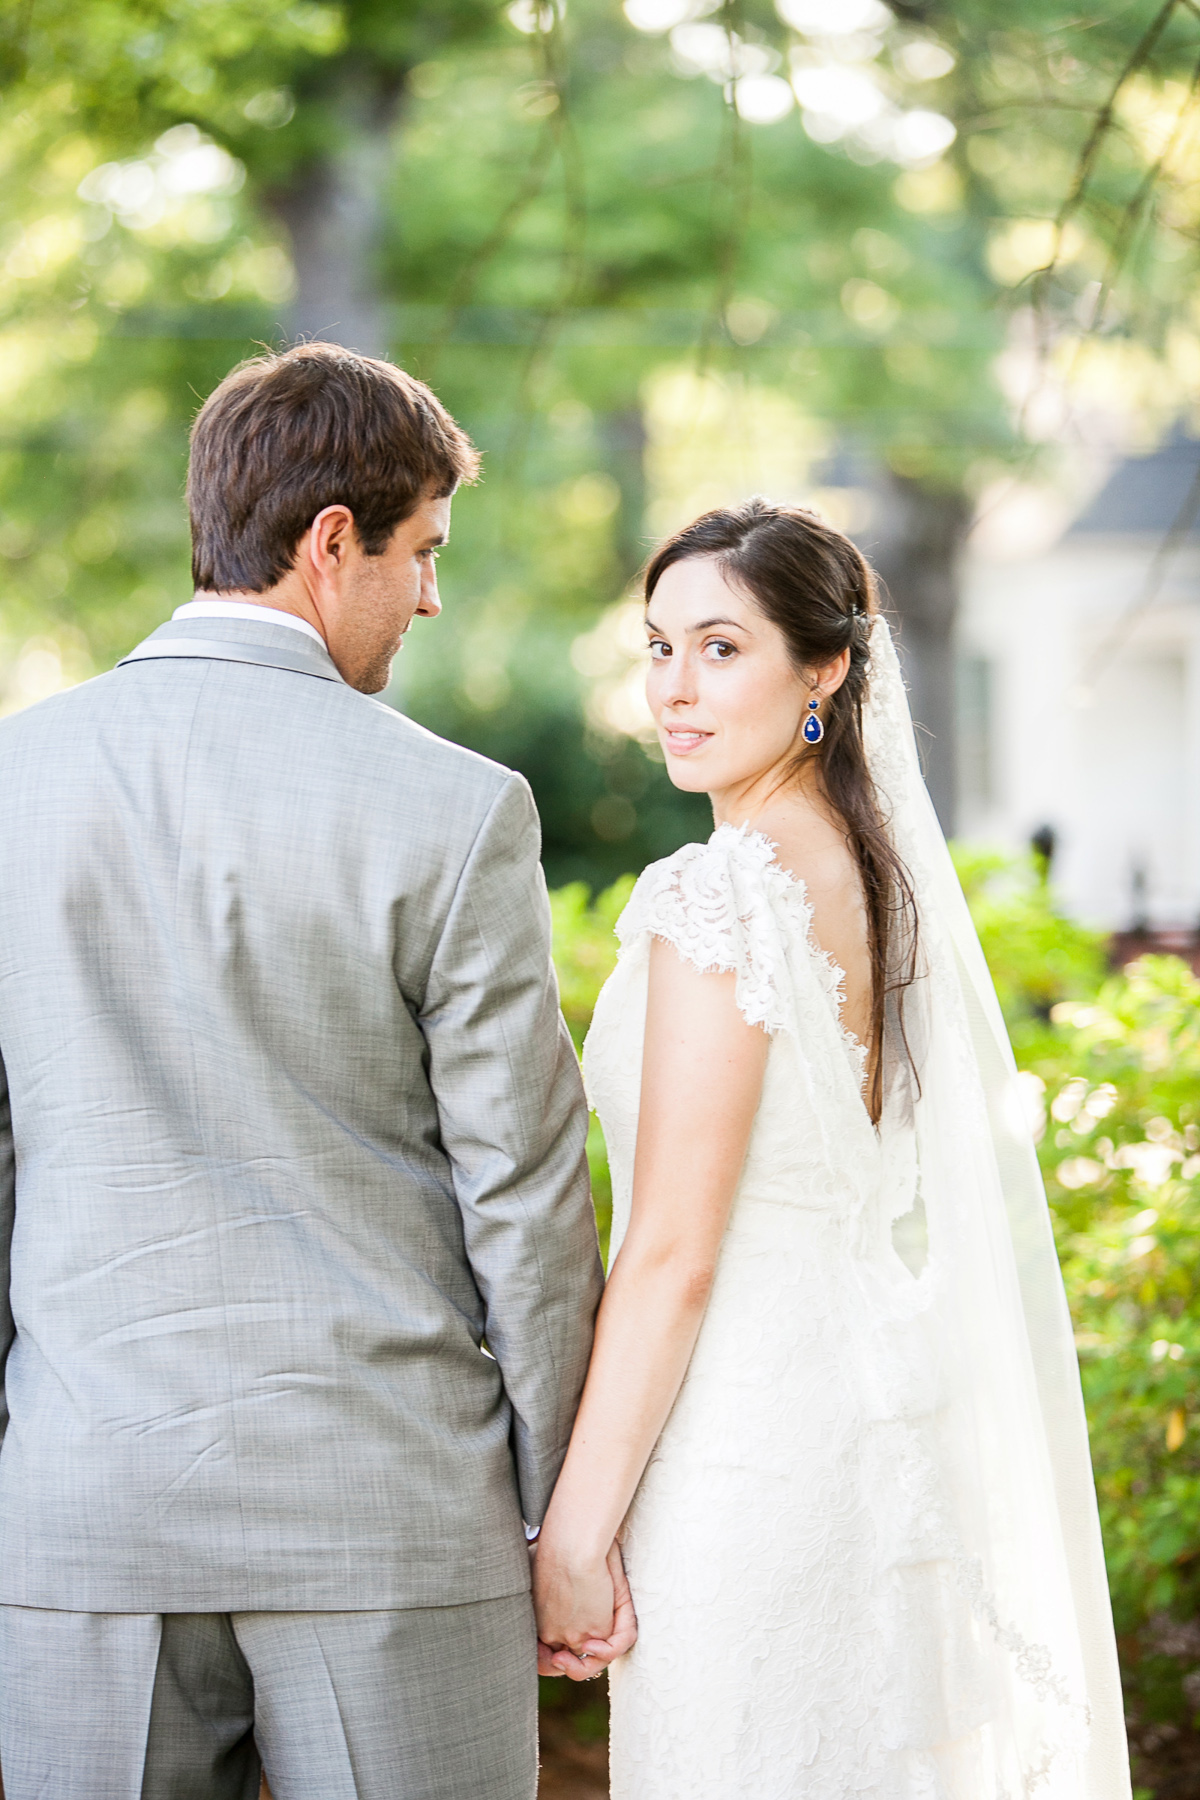 Weddings-SS-portfolio-I-0002.jpg